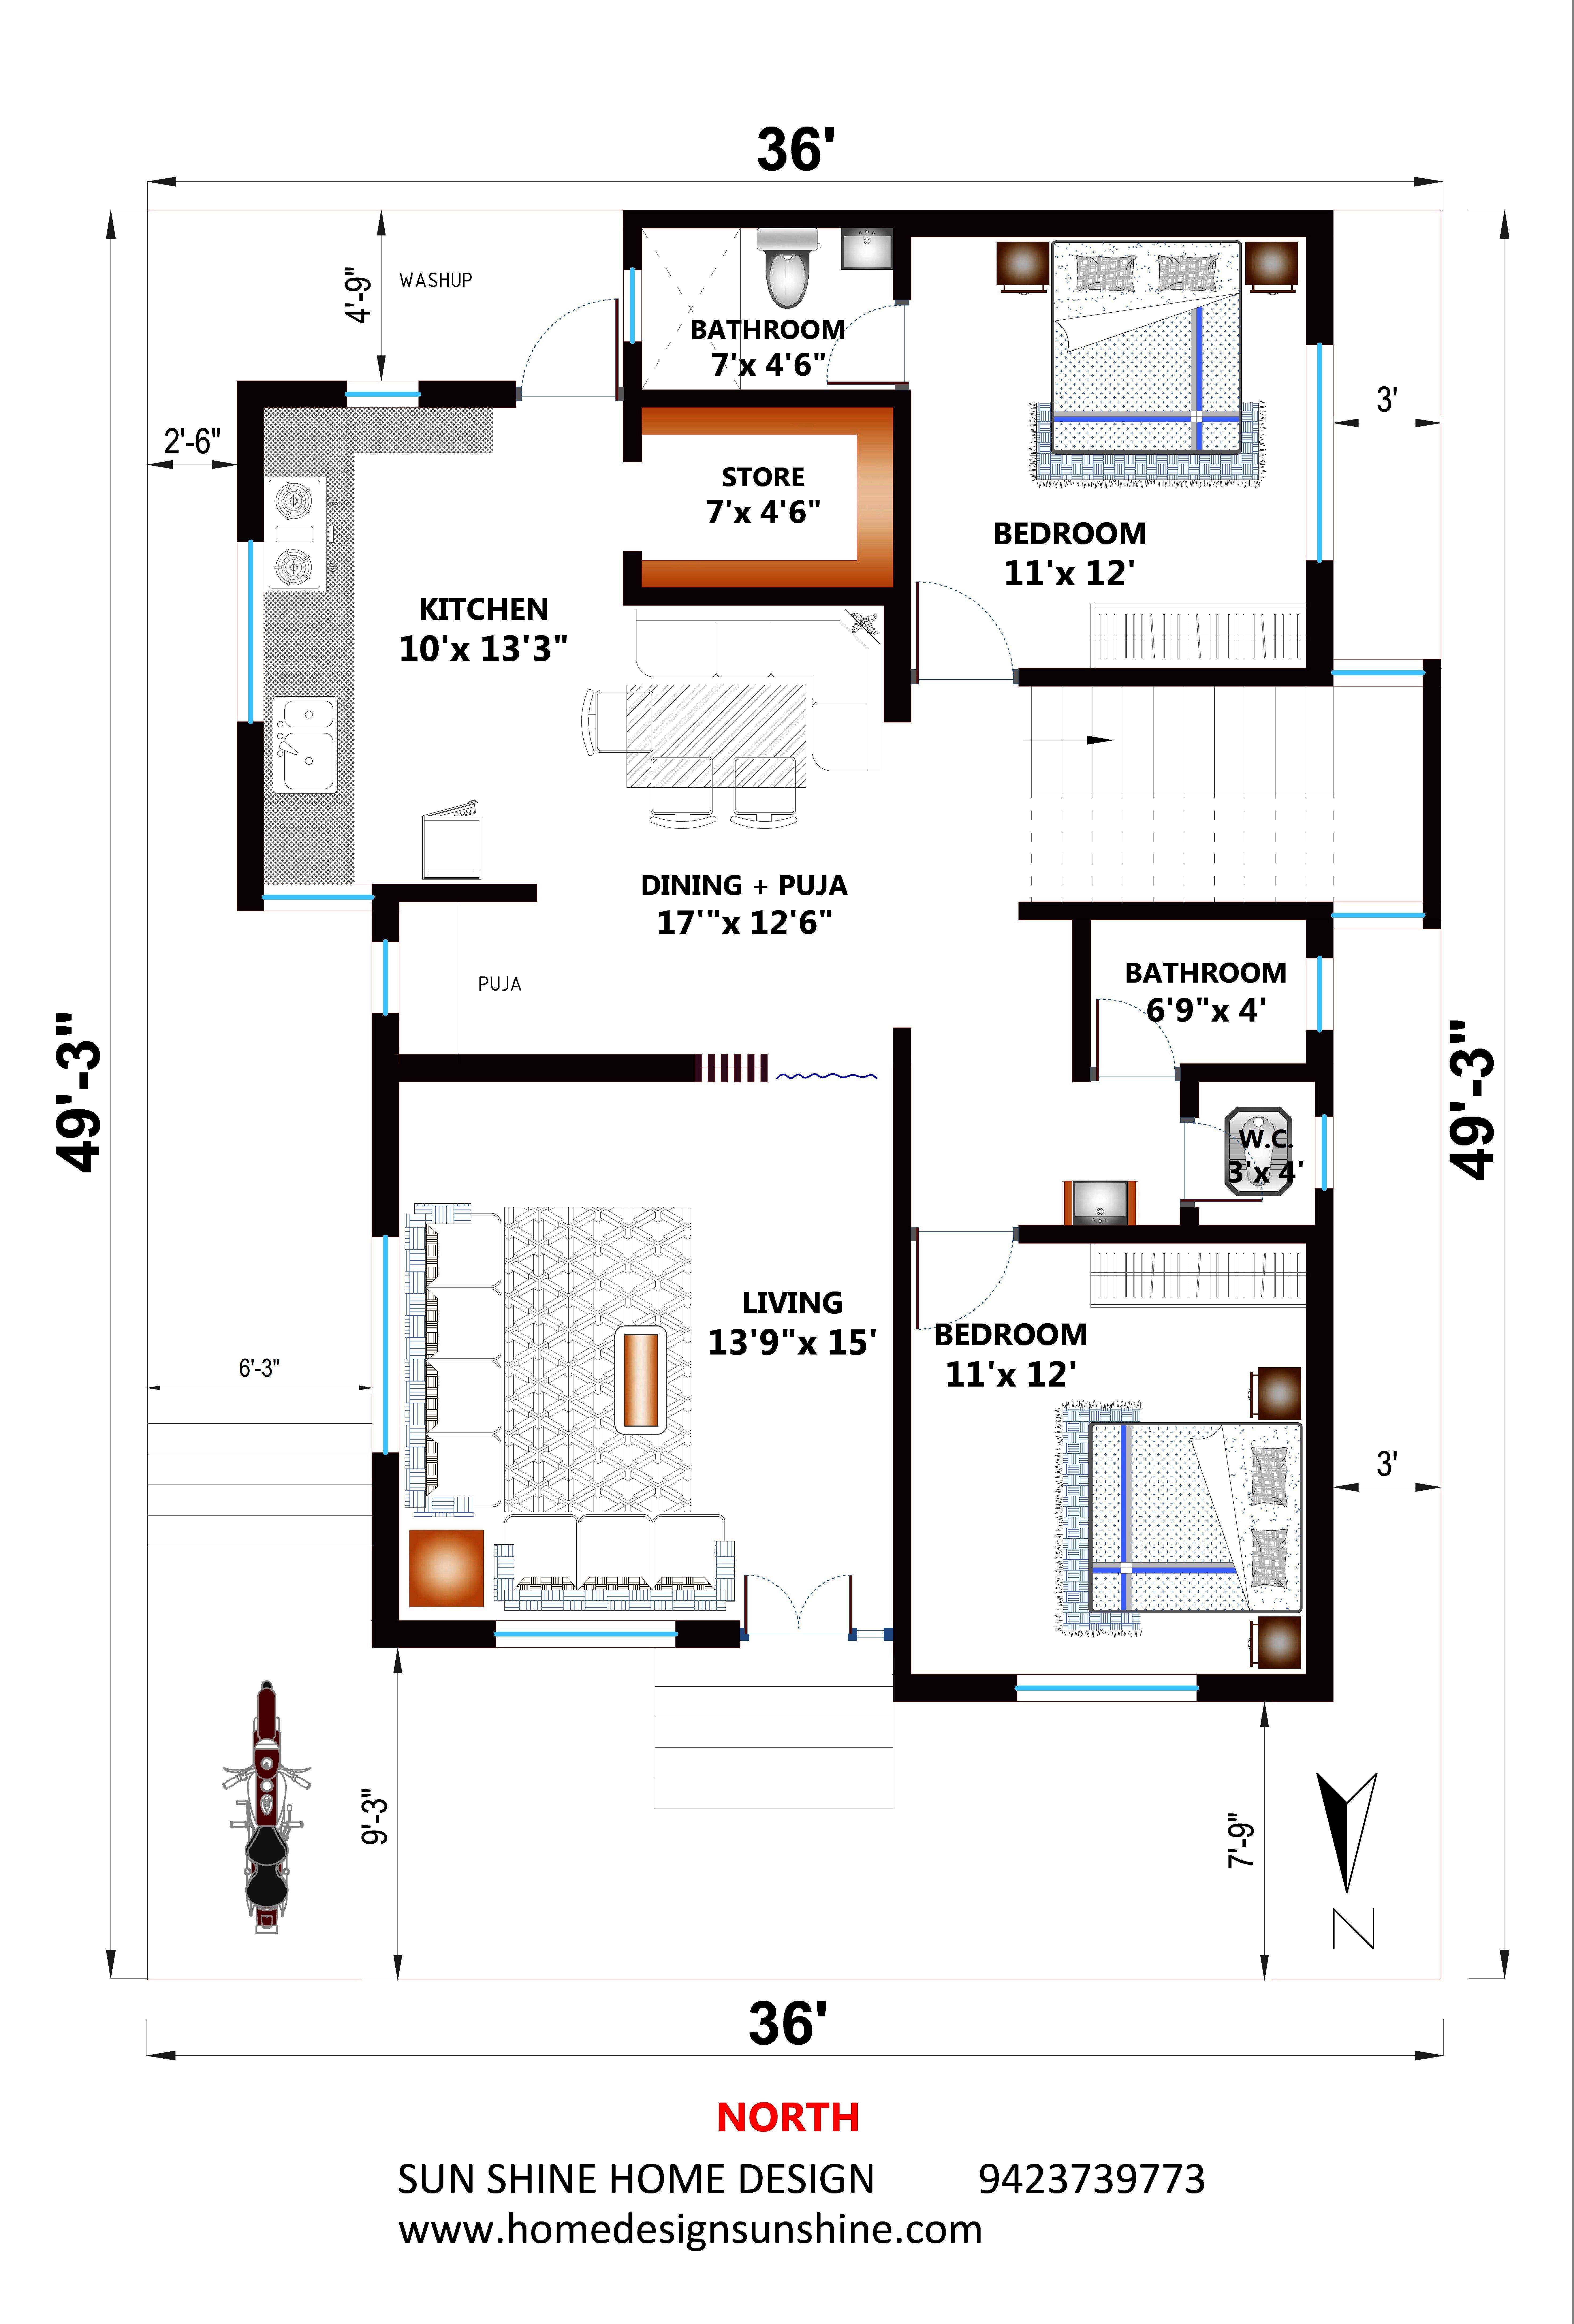 Https Youtu Be Ntdym0u4qle Watch Detail Video For Understanding The Deep Micro Planning Concepts New House Plans My House Plans Model House Plan